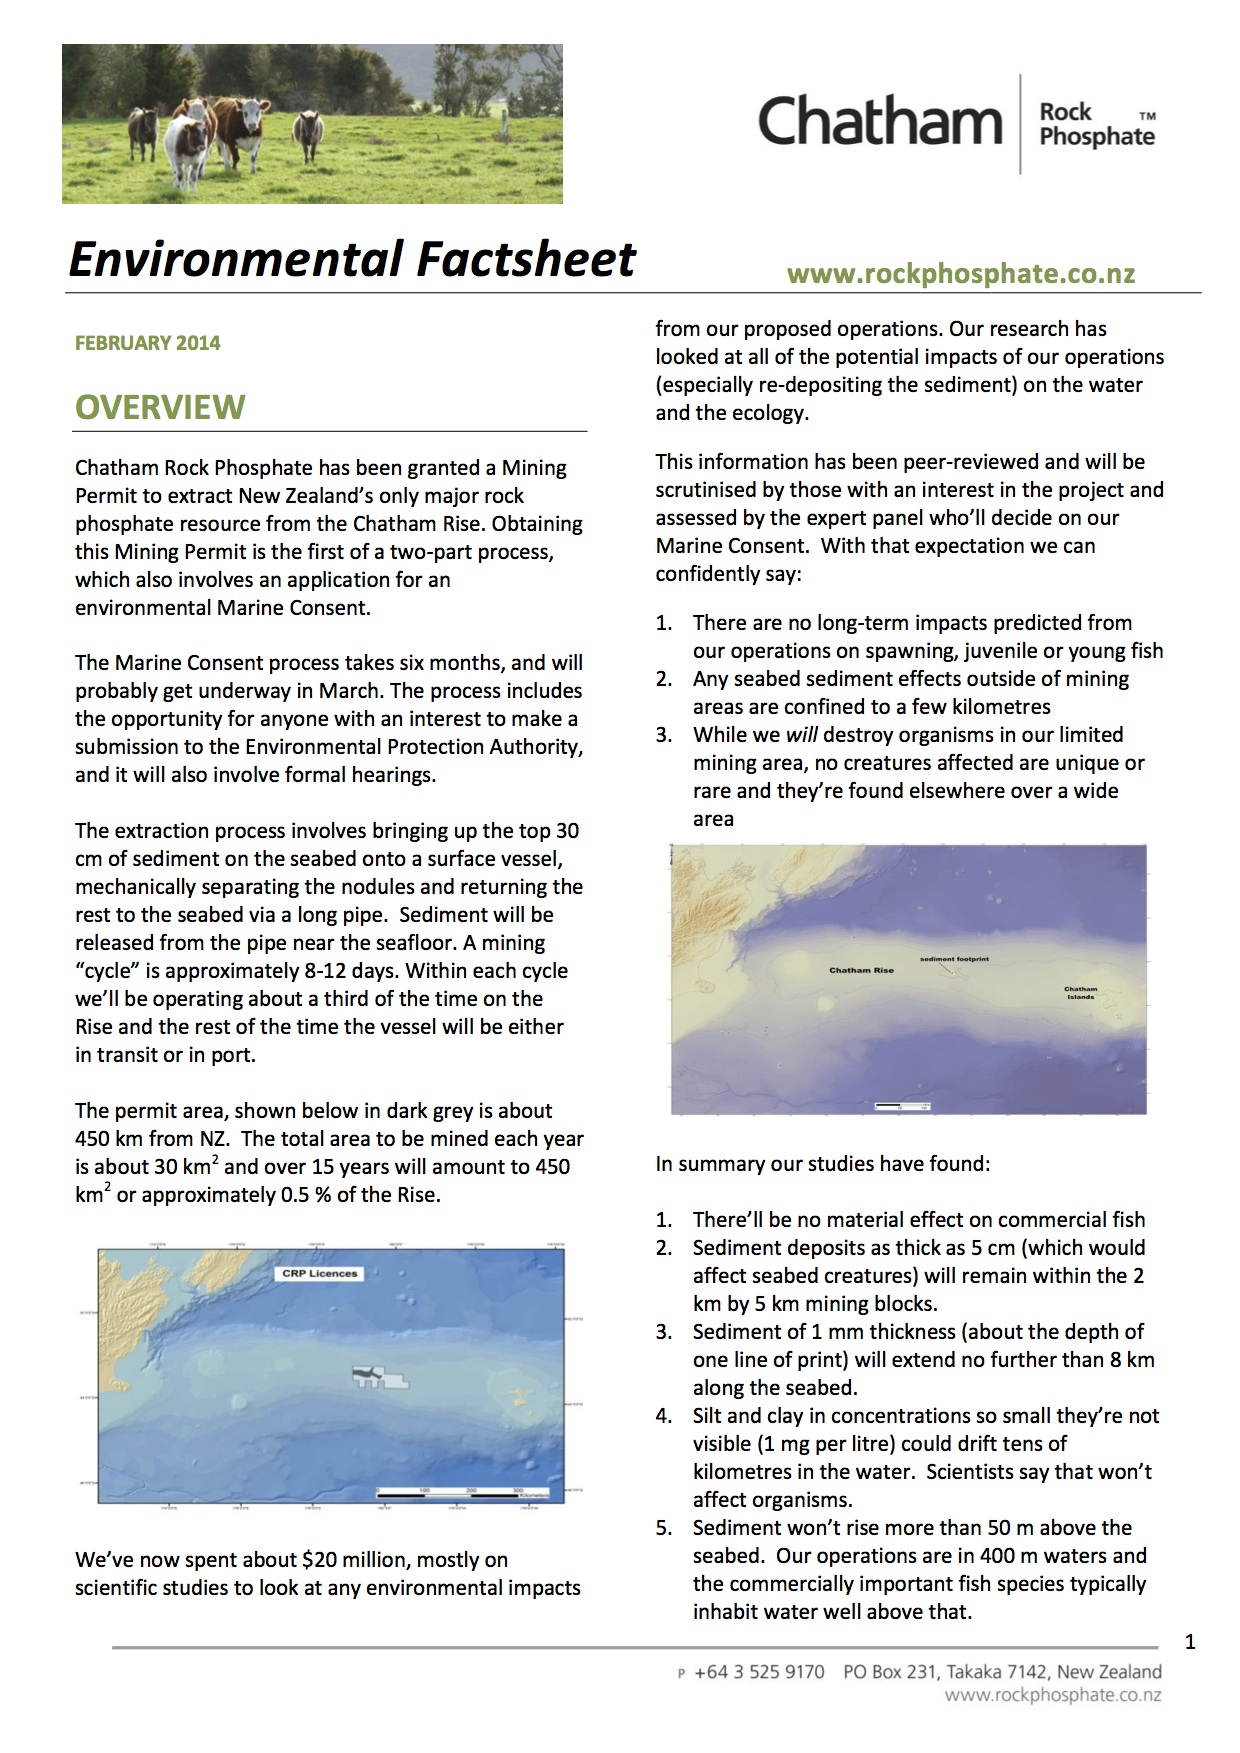 Environmental Fact Sheet Feb 2014.jpg